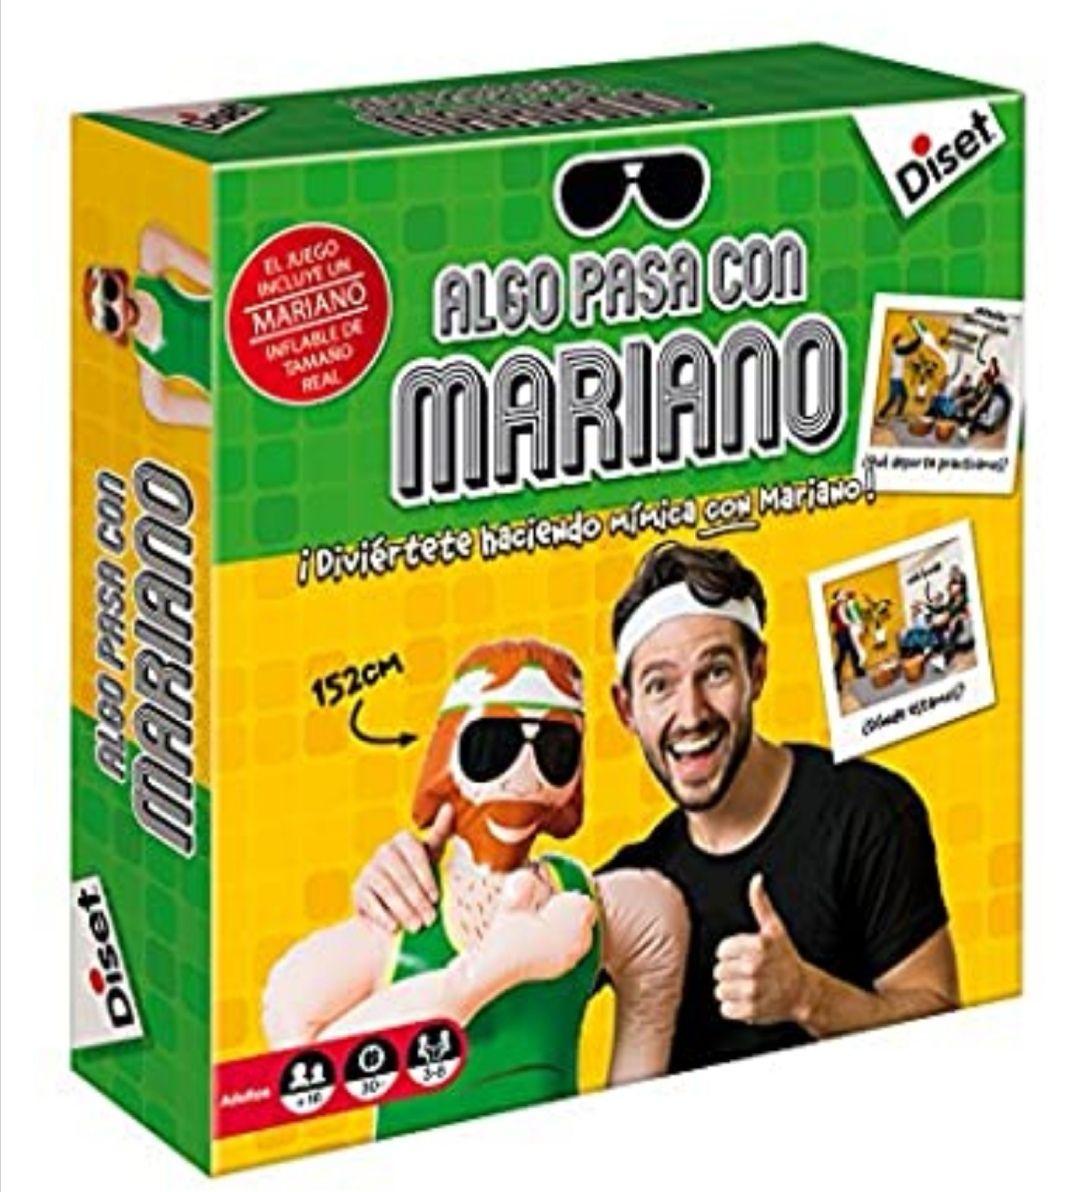 Diset. Juego Algo Pasa con Mariano